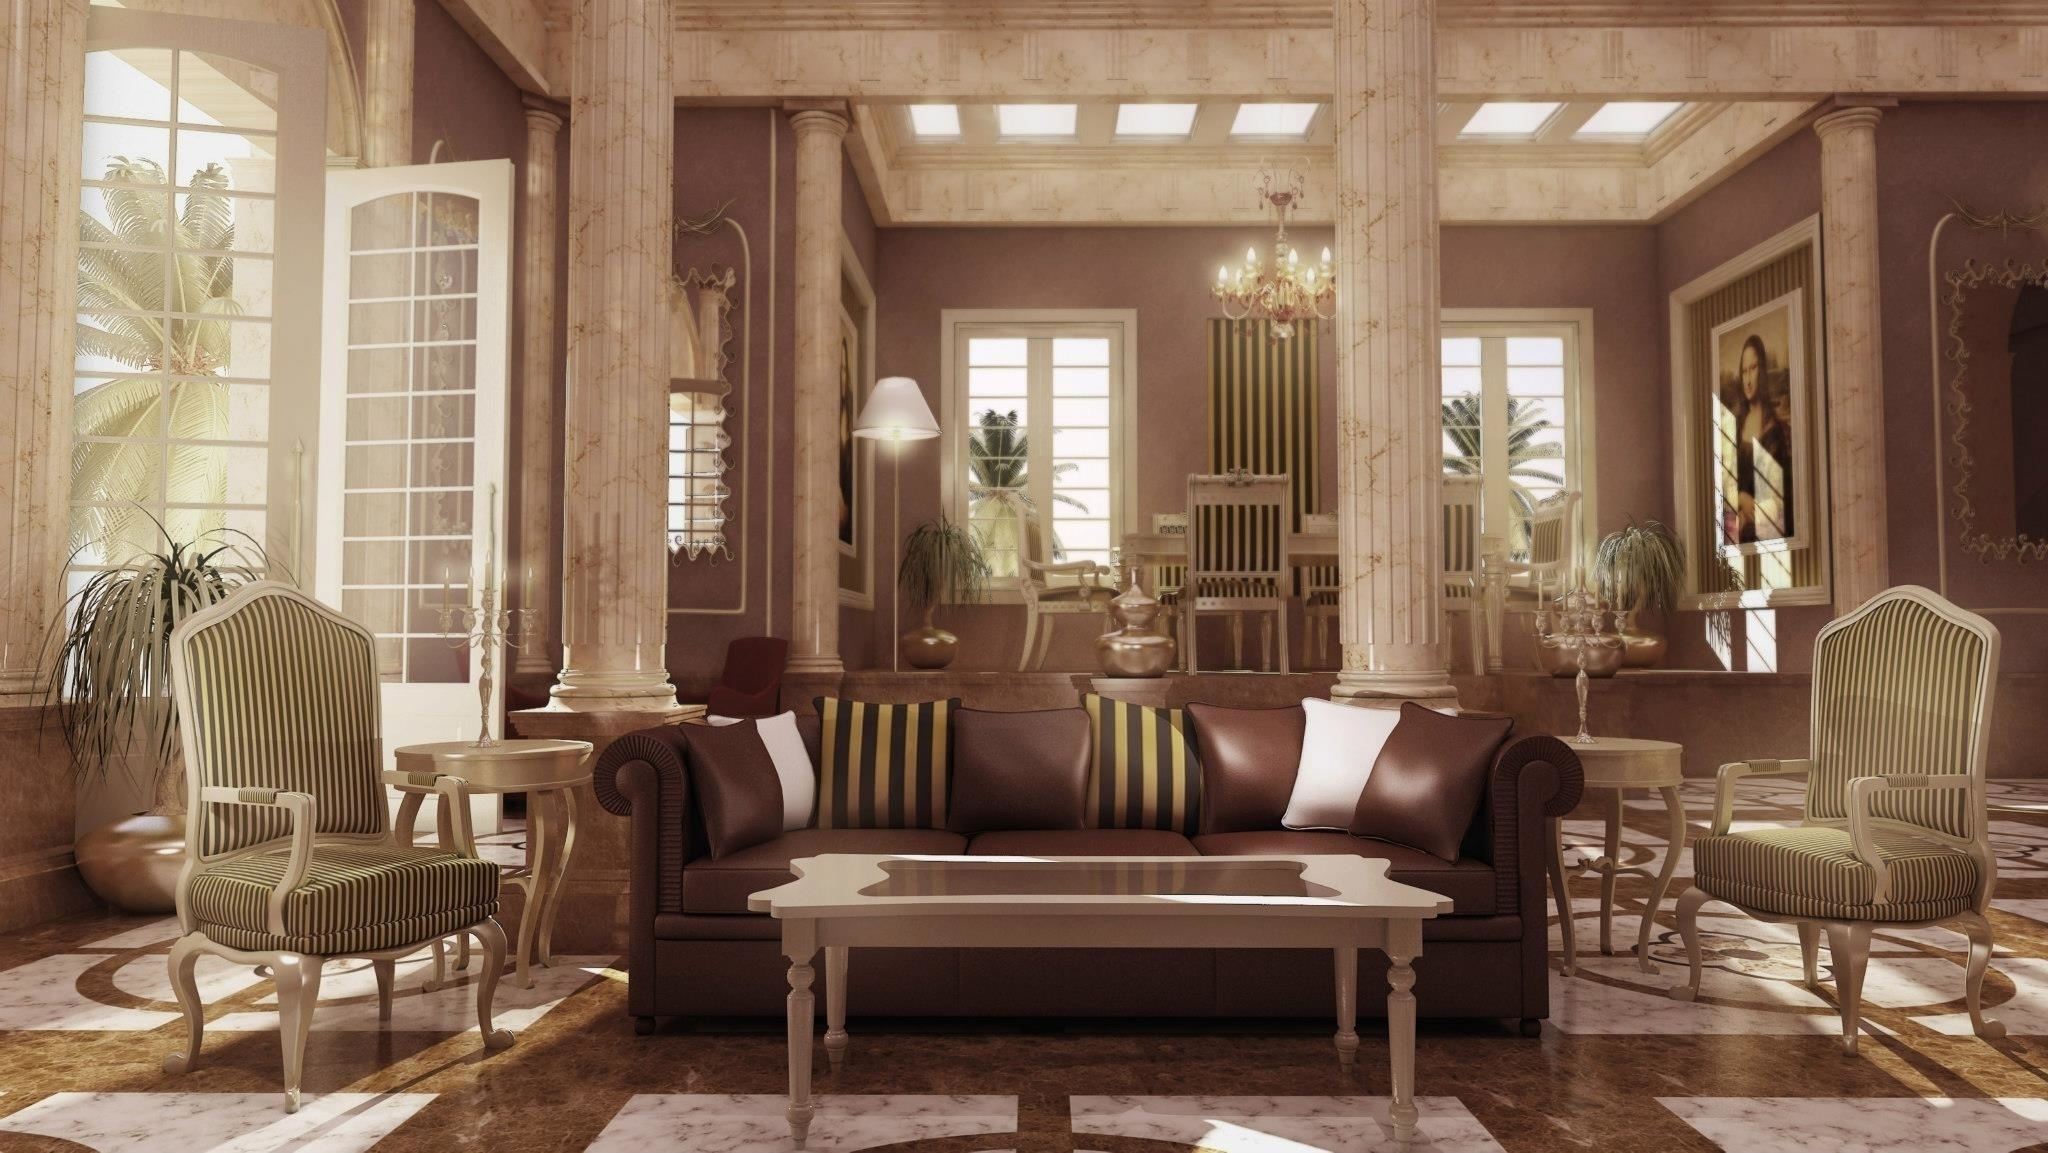 Villa Interior - design, interior - malikaamir | ello